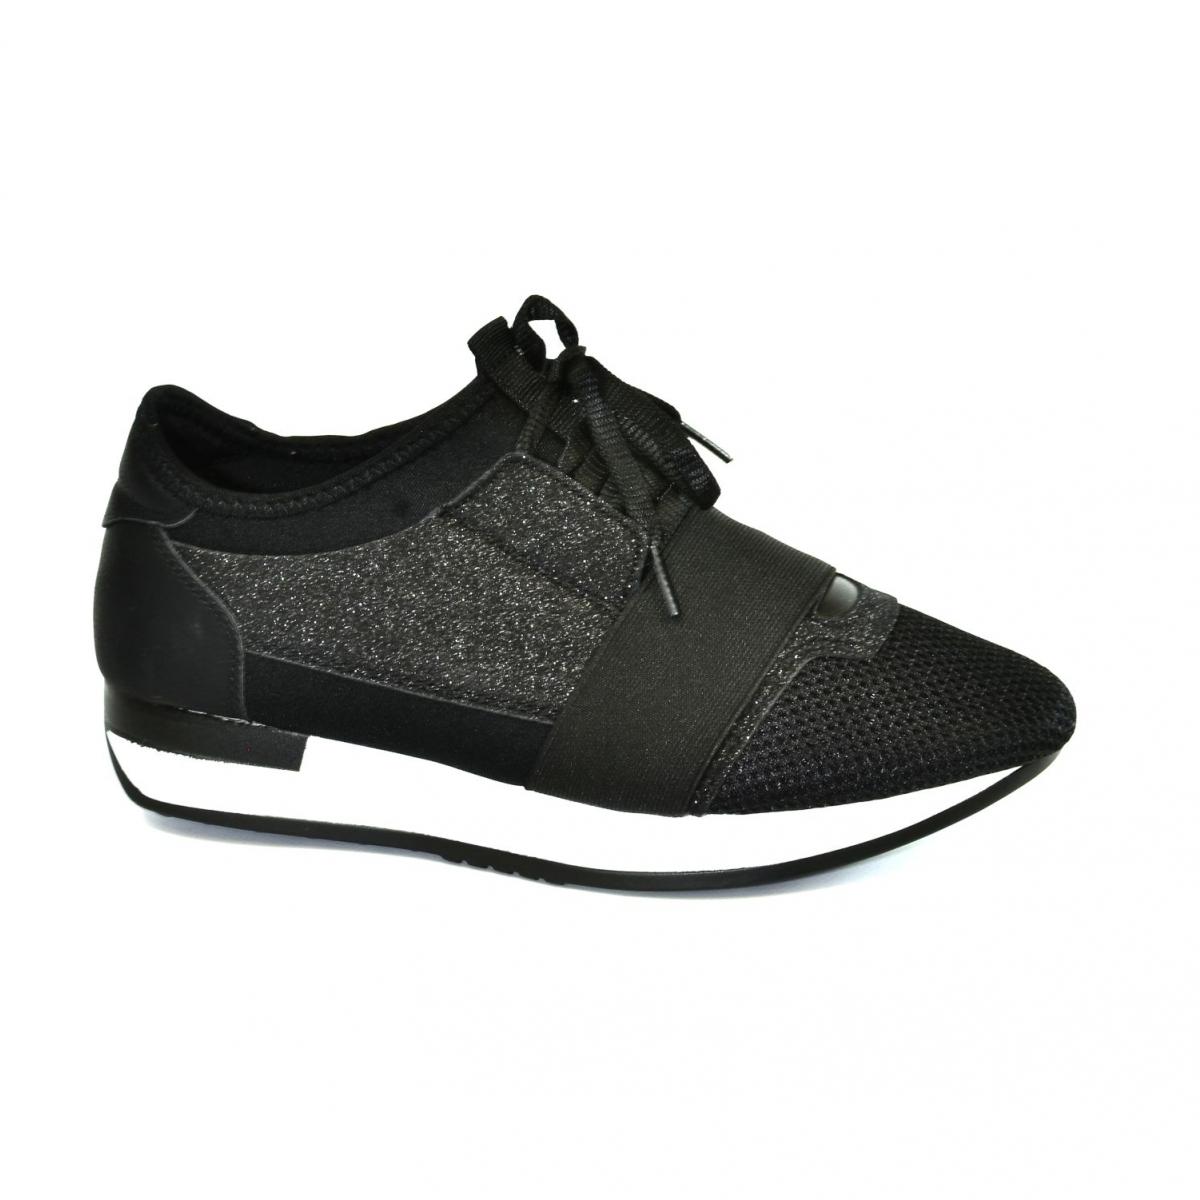 bf46d23f87f9 Dámske čierne botasky BRIEN - 5